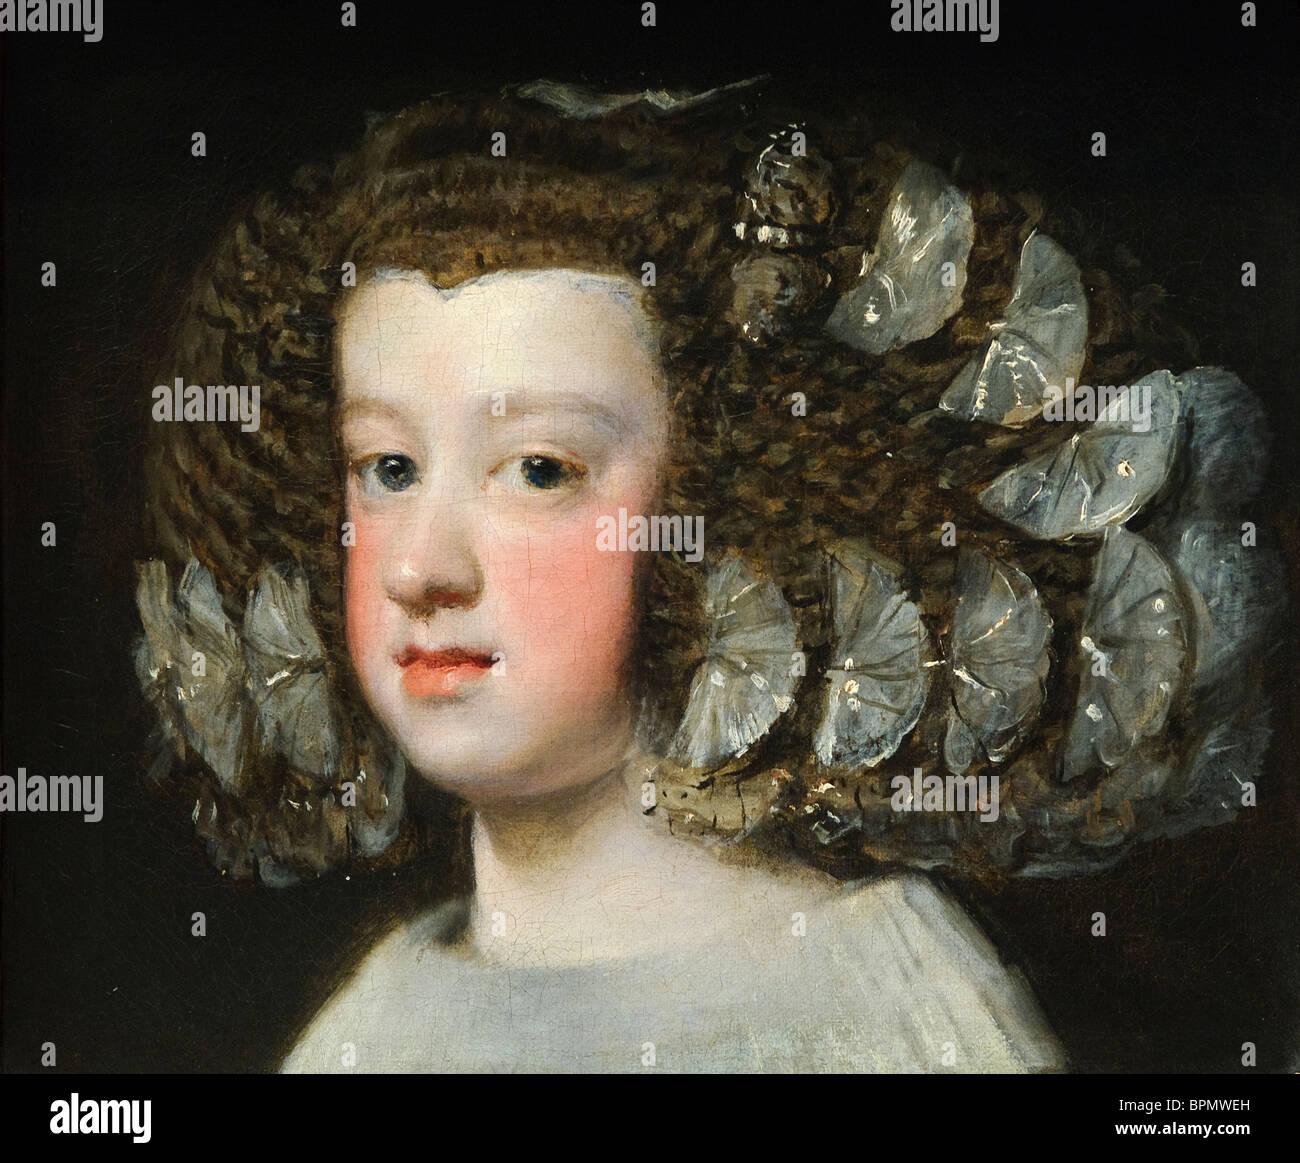 María Teresa (1638-1683), Infanta di Spagna, Velázquez Immagini Stock